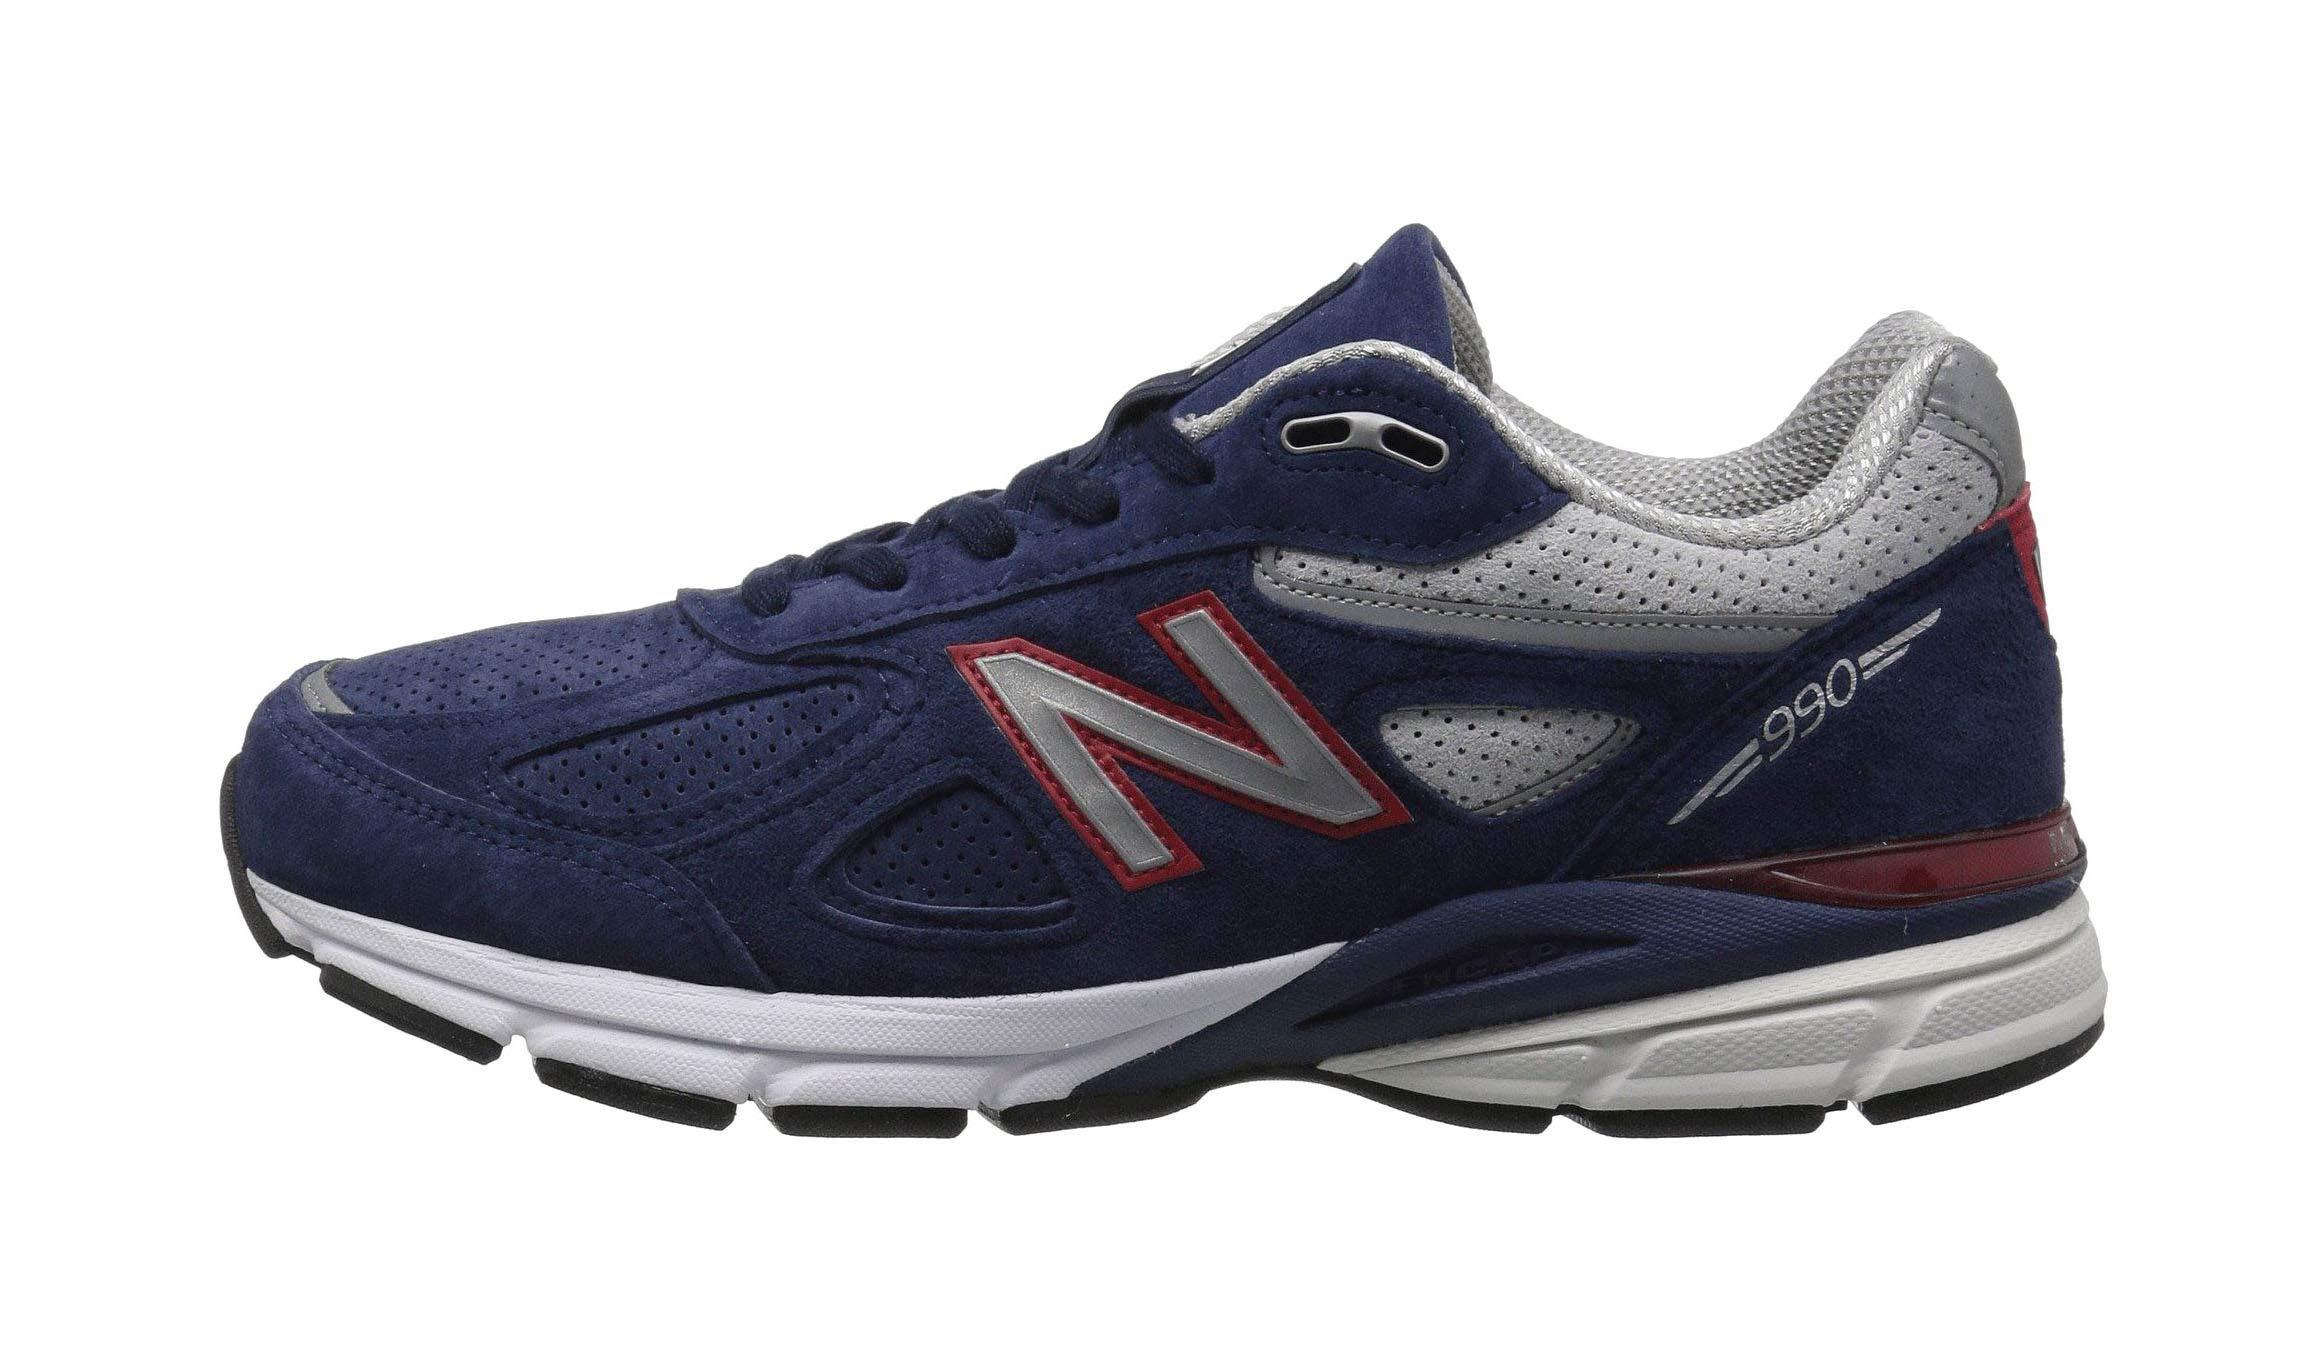 New Balance Men's 990v4 Running Shoe Blue/Pigment Red 10 D US